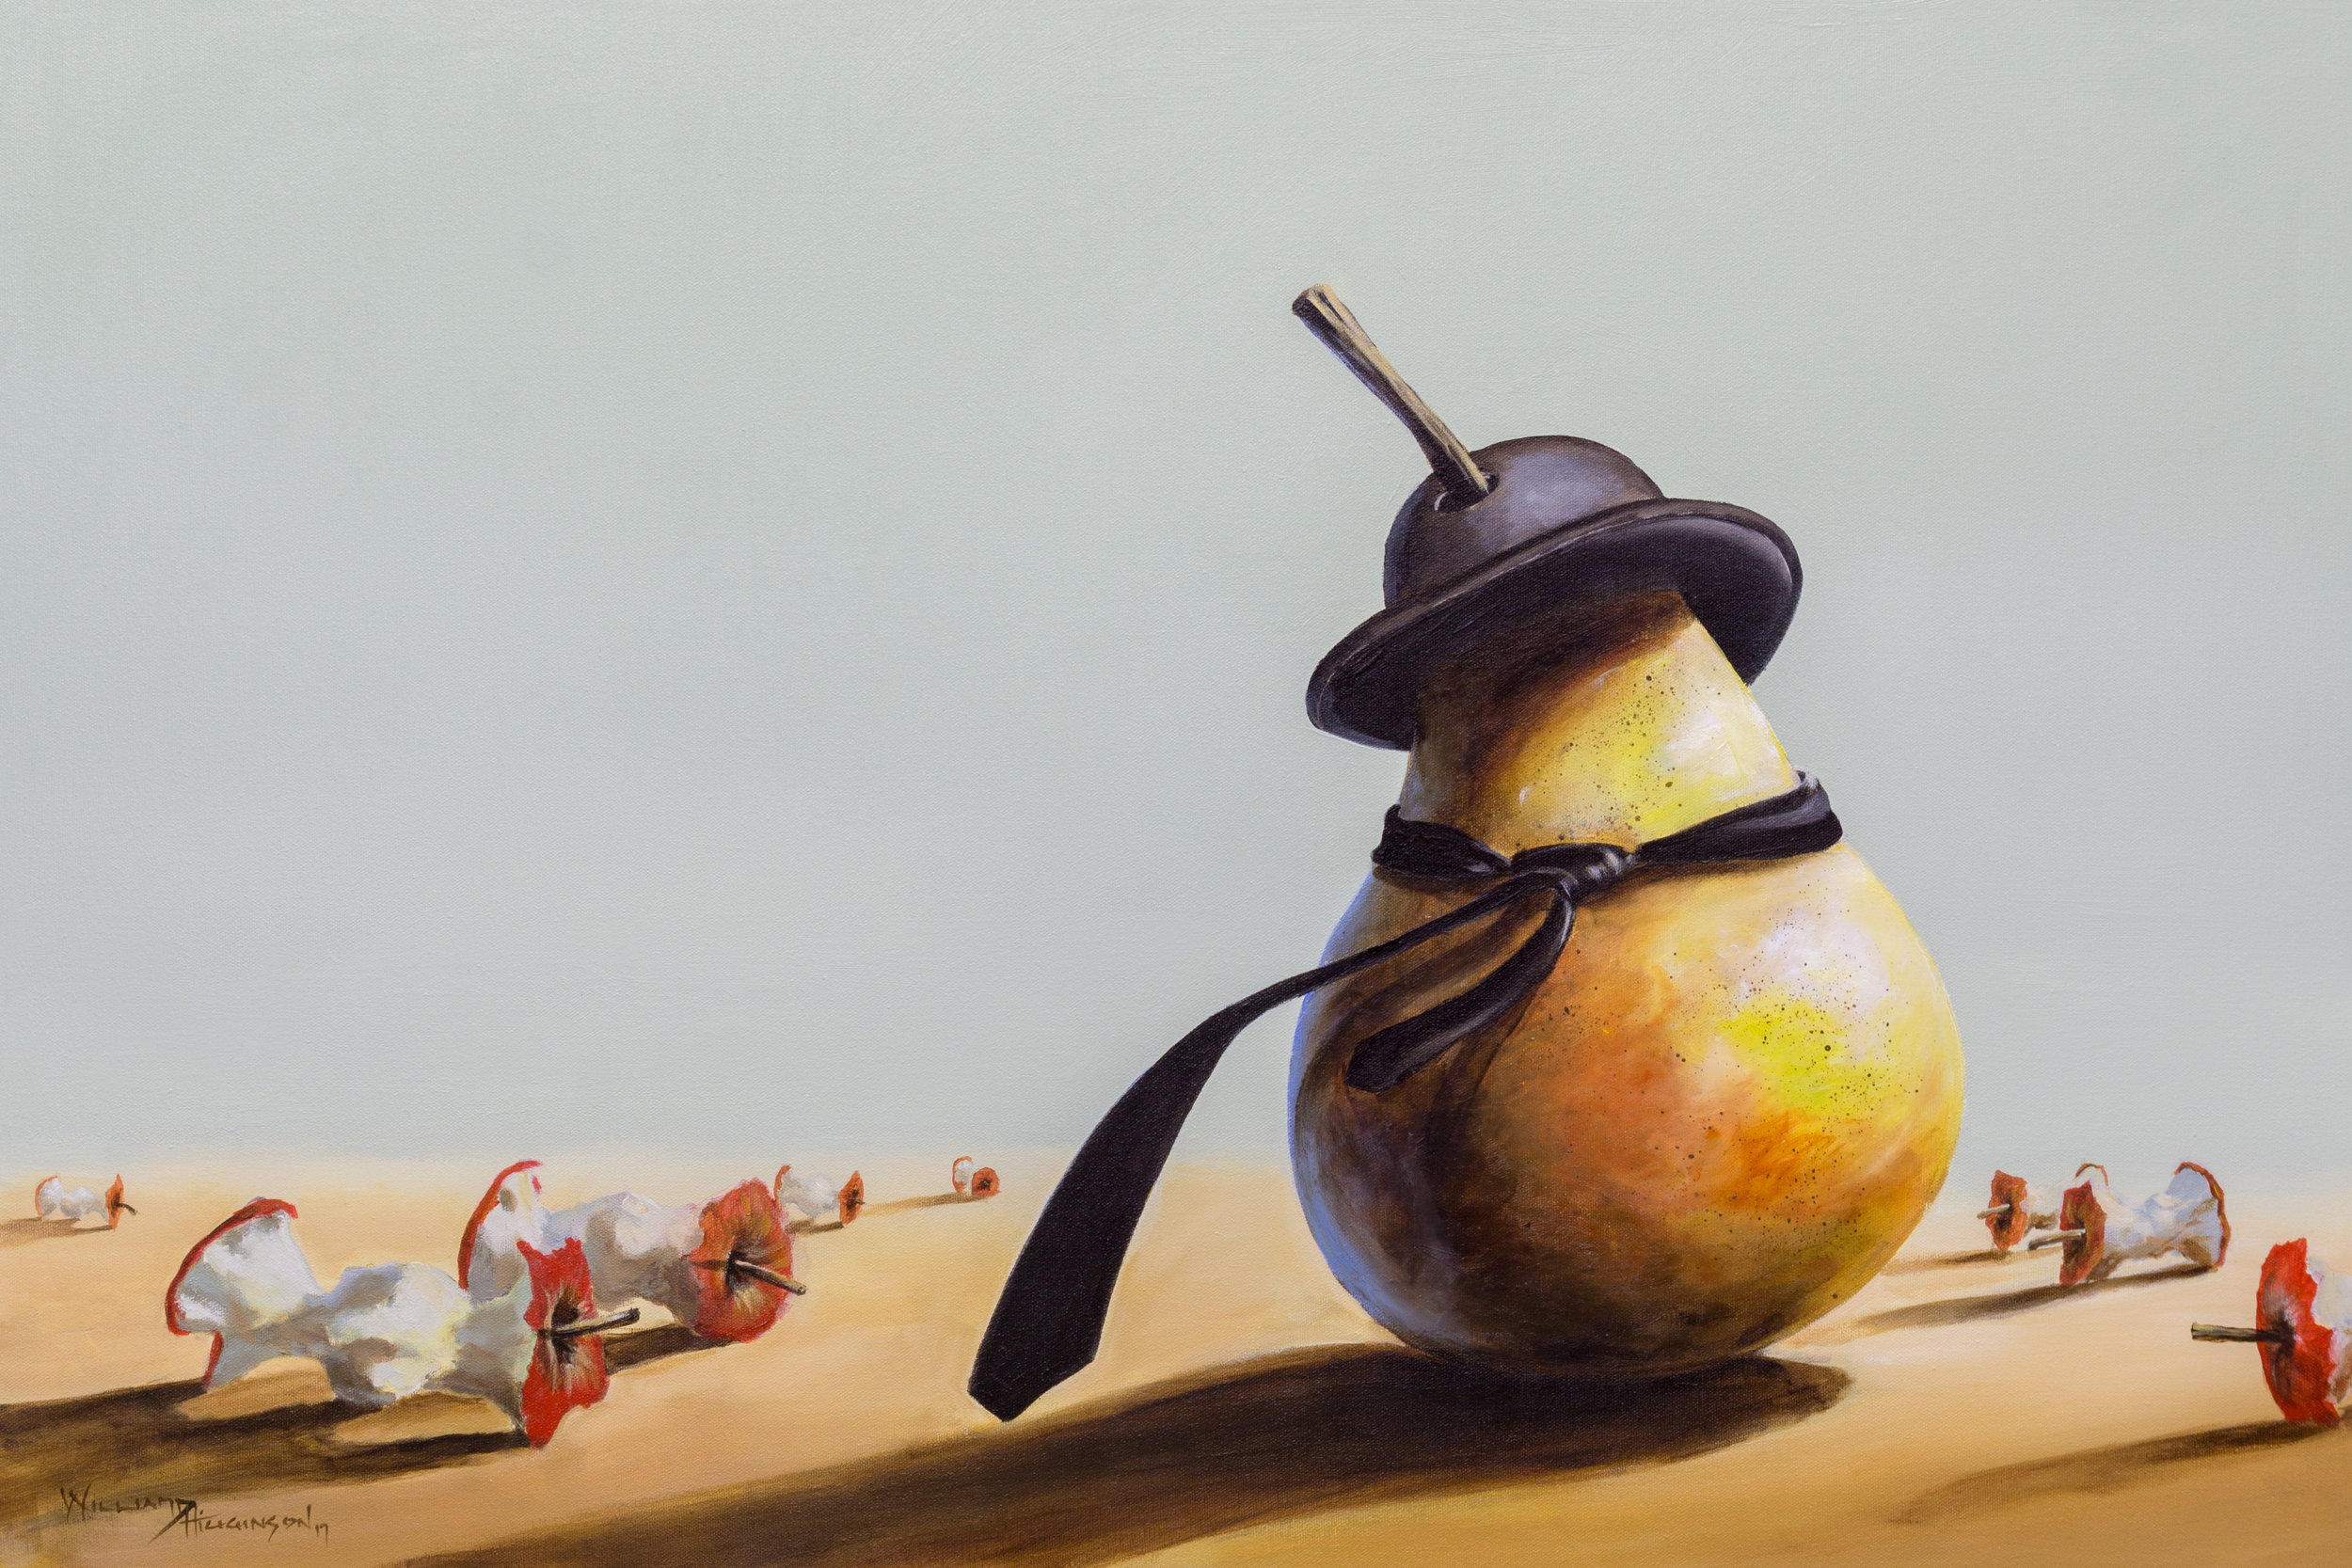 saje - William D. Higginson - surrealism art.jpg